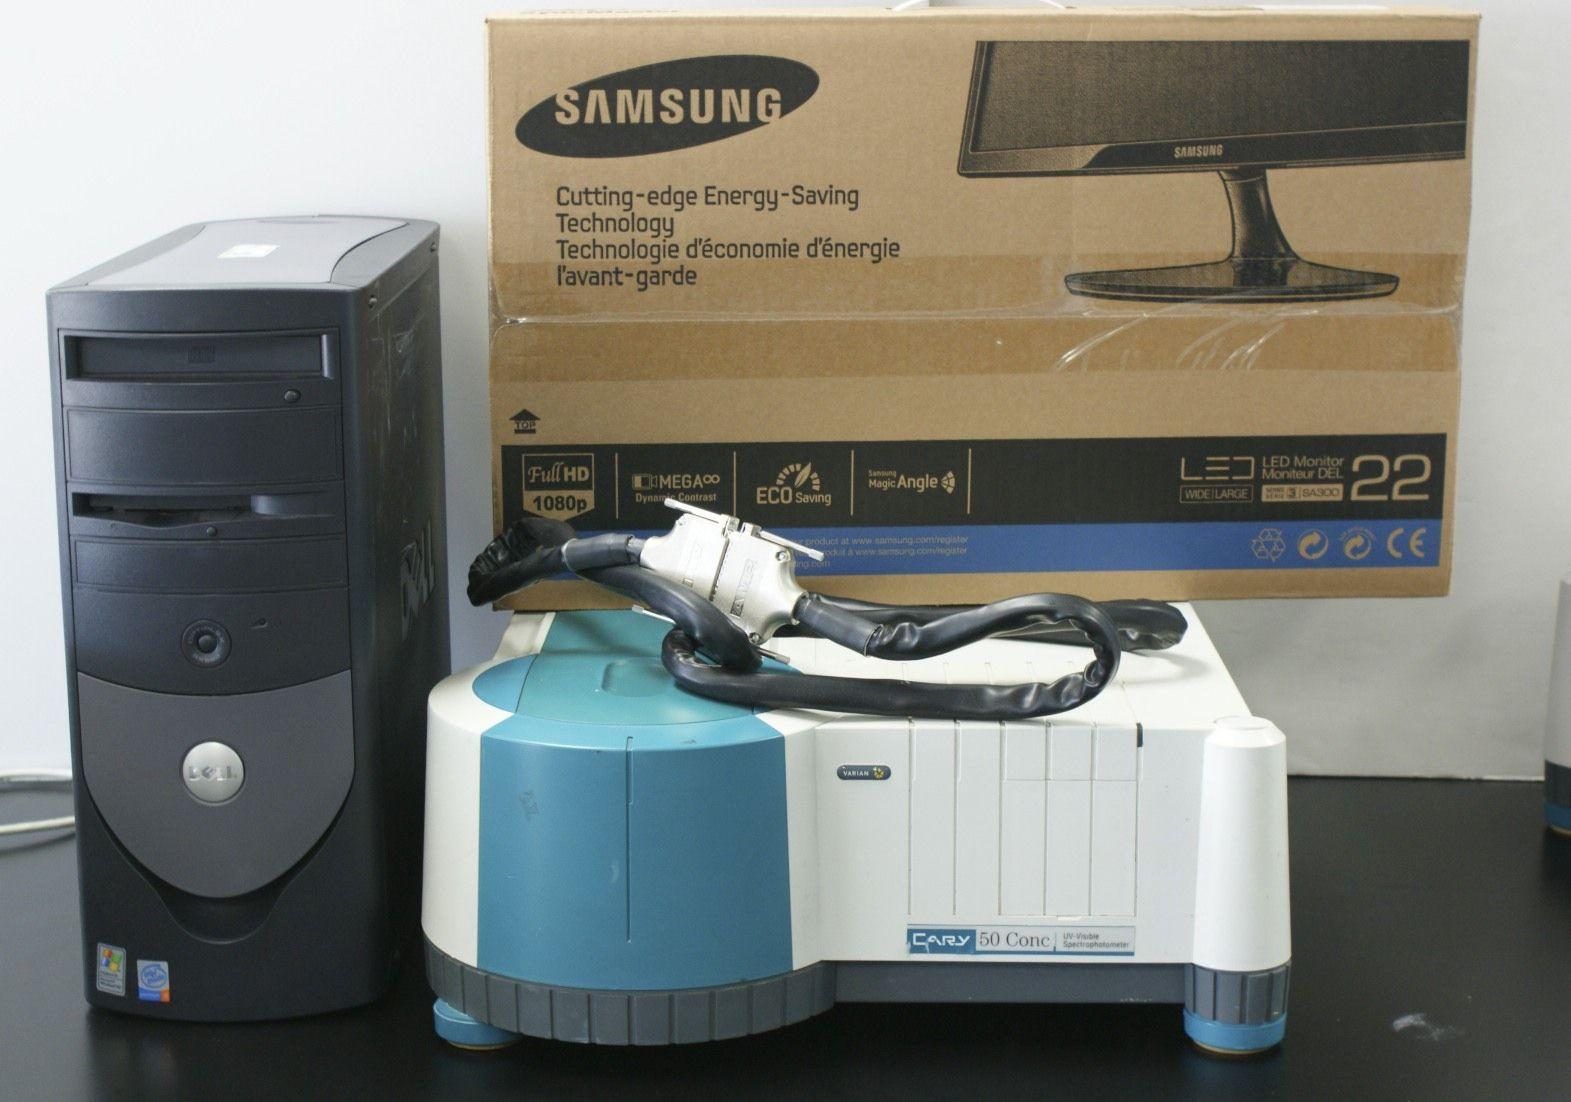 Varian CARY 50 Conc Agilent Varian CARY 50 CONC UV-VIS Spectrophotometer Varian Spectrophotometer